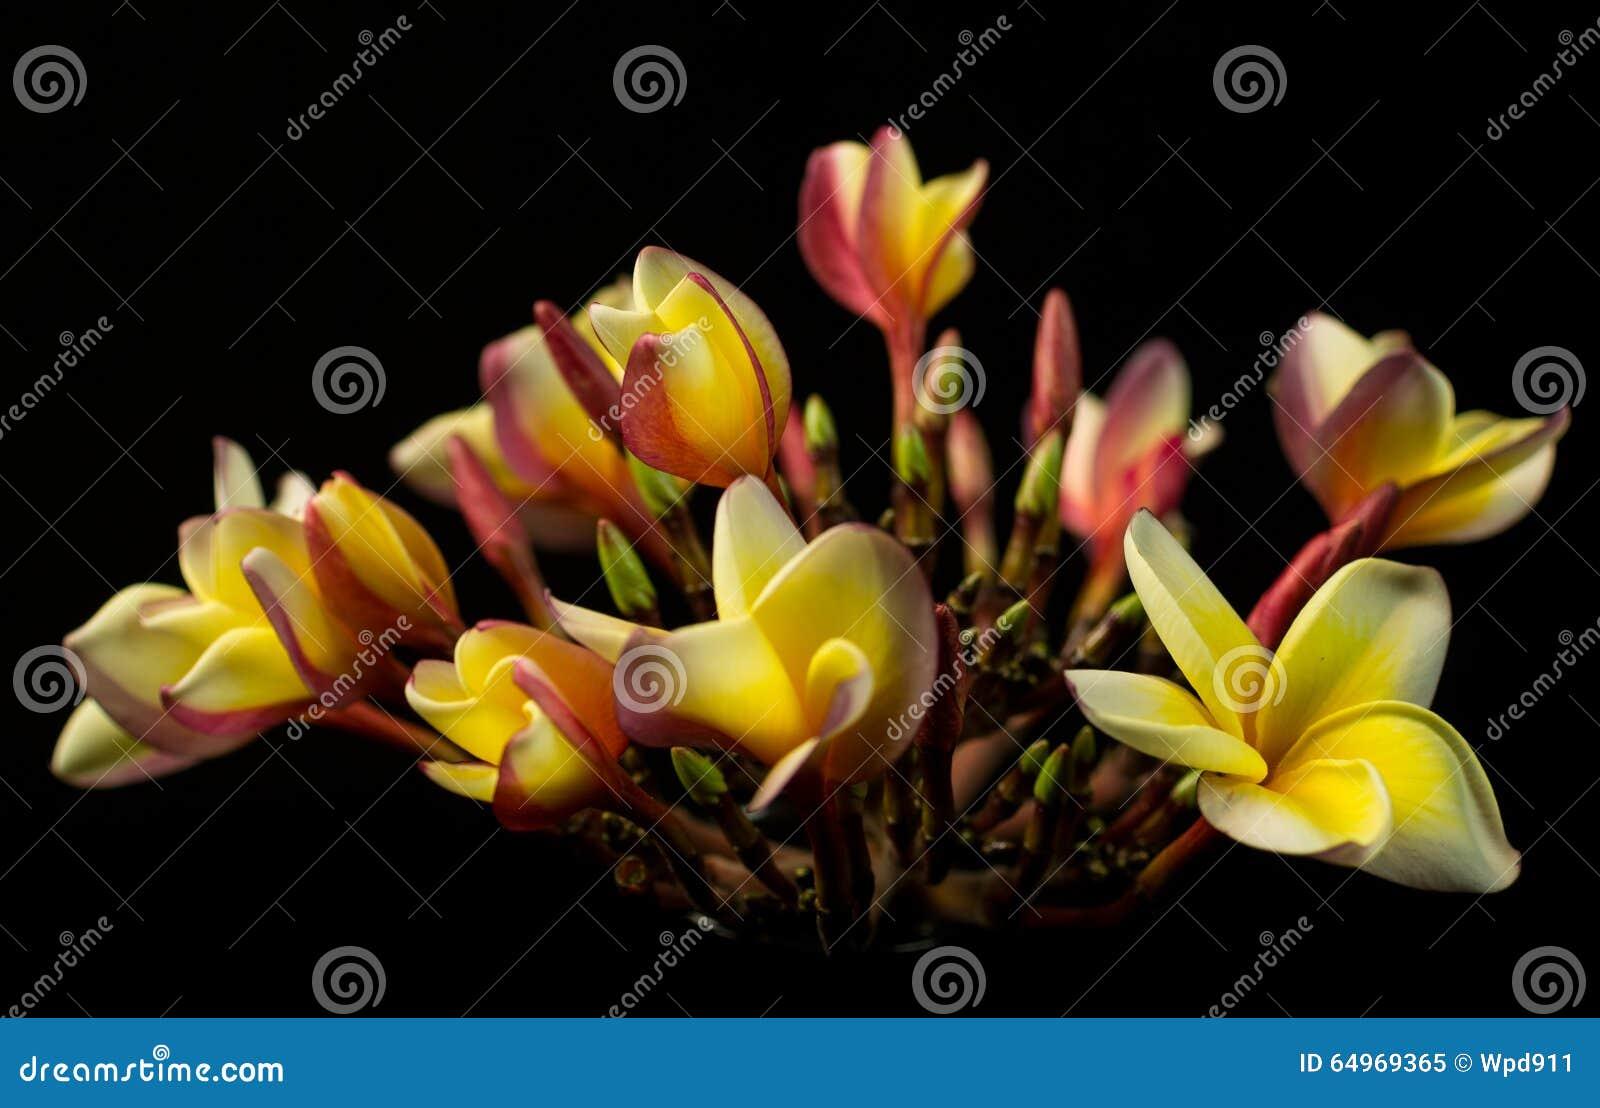 Hawaiian plumeria flower stock image image of bloom 64969365 download hawaiian plumeria flower stock image image of bloom 64969365 izmirmasajfo